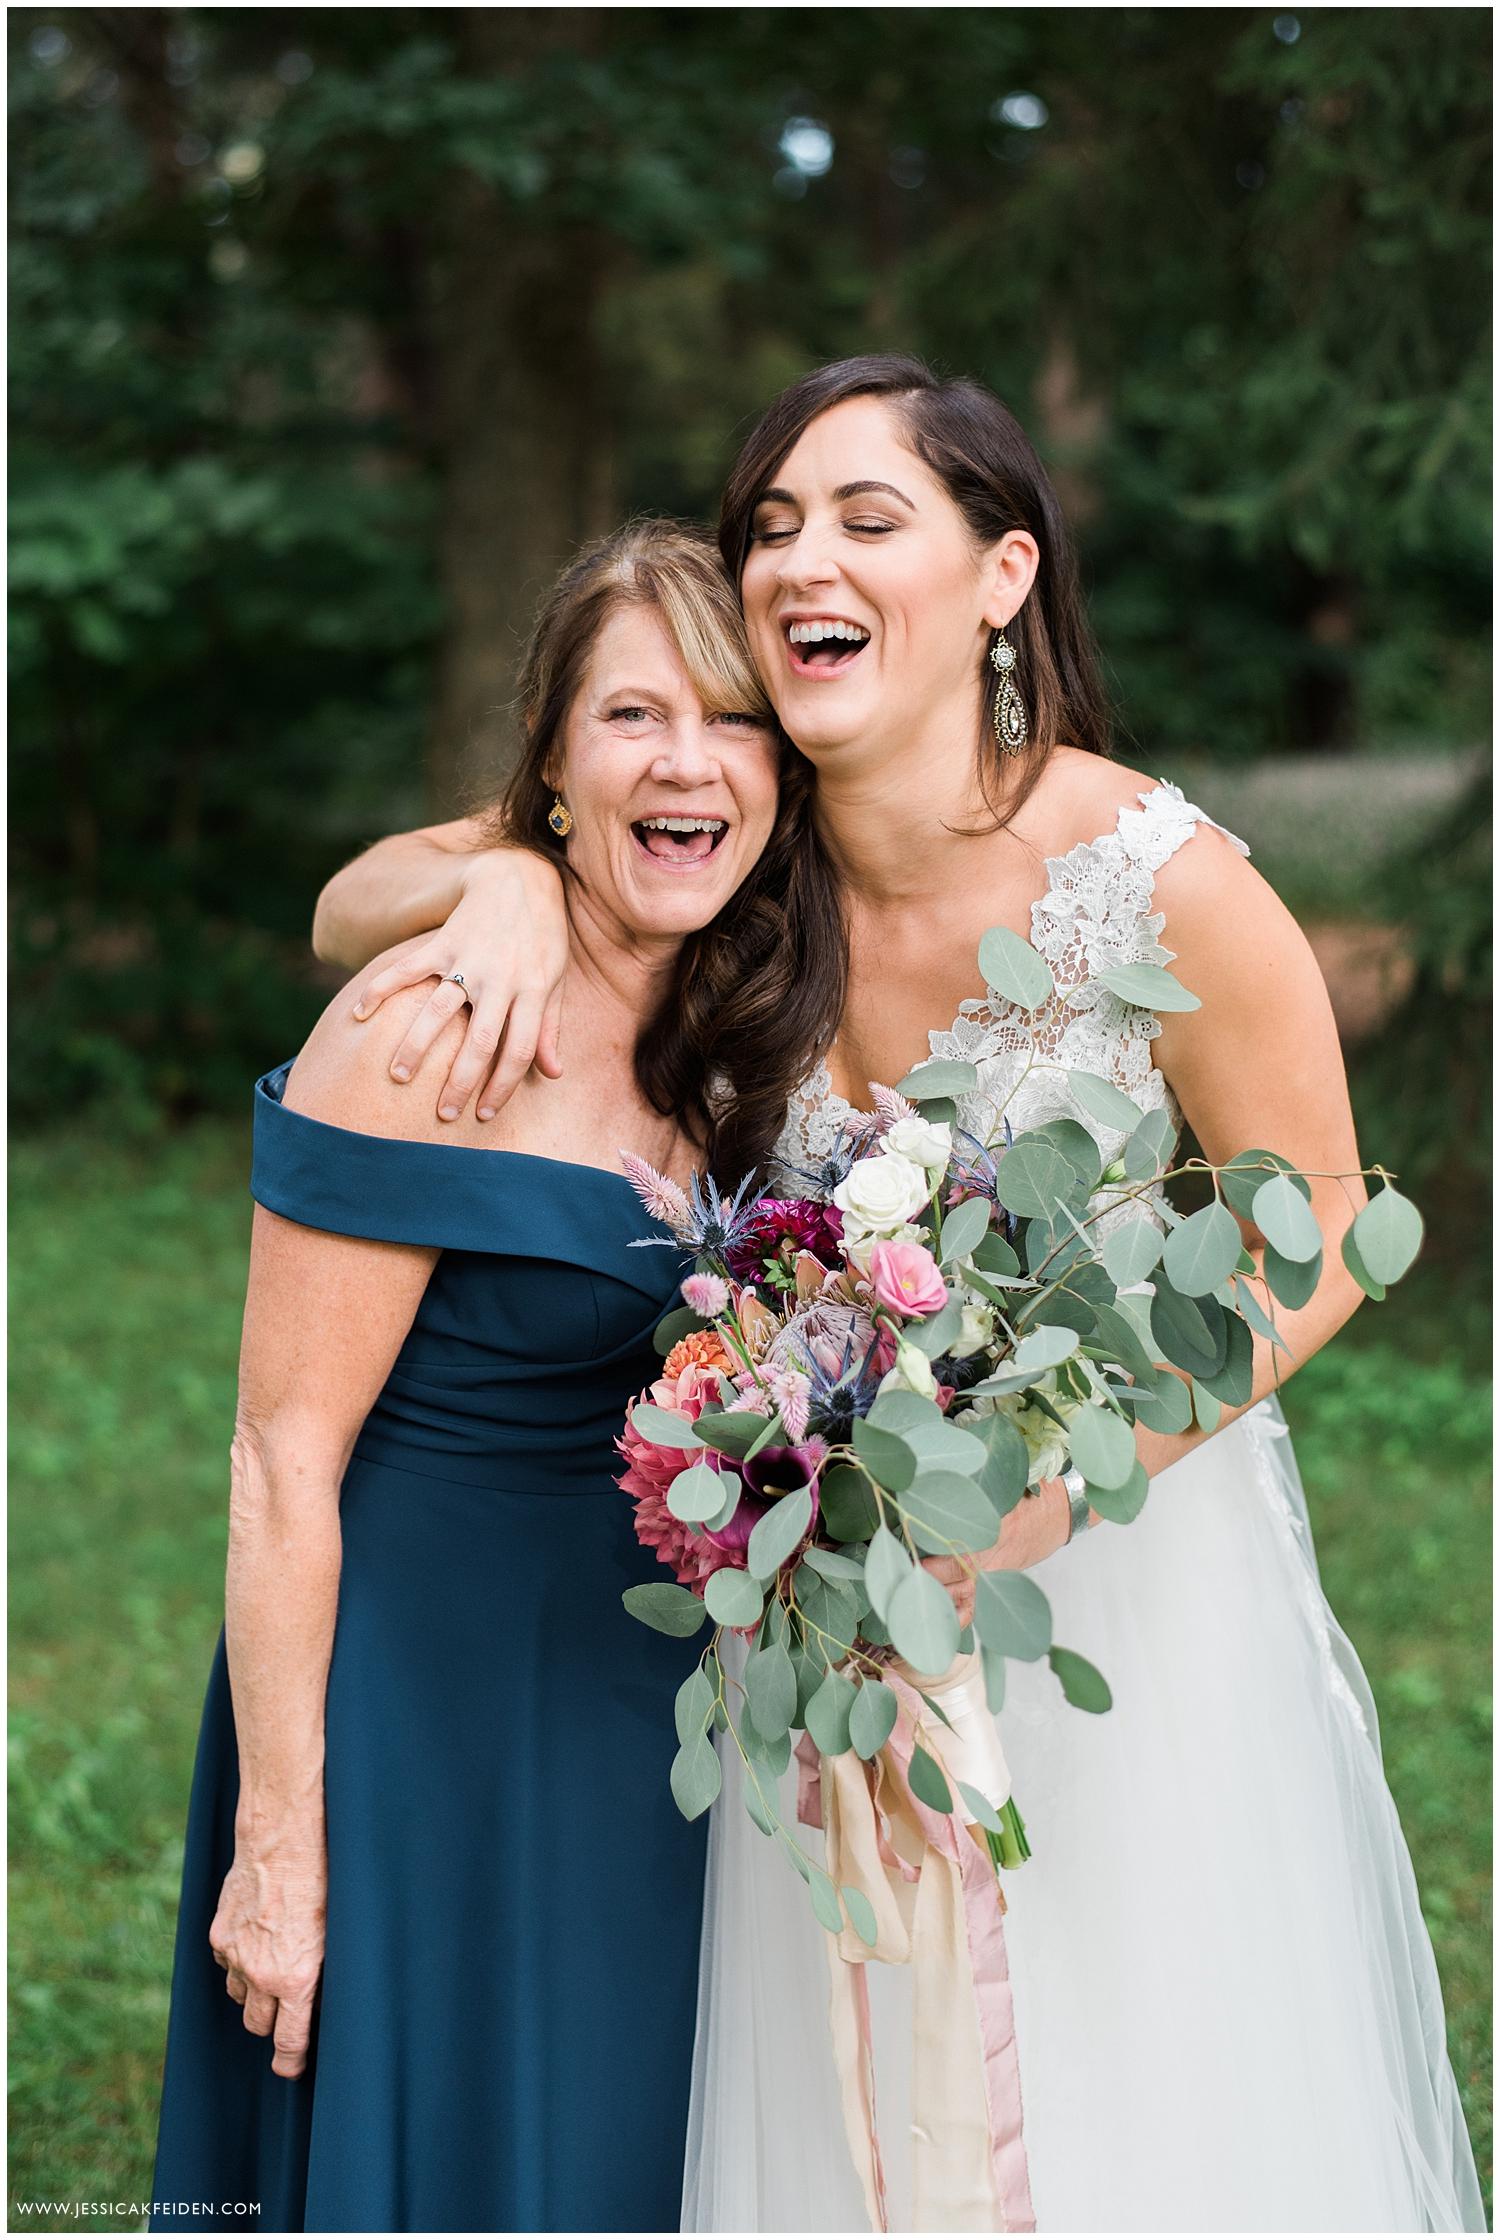 Jessica K Feiden Photography_Gardens at Elm Bank Wedding_0012.jpg